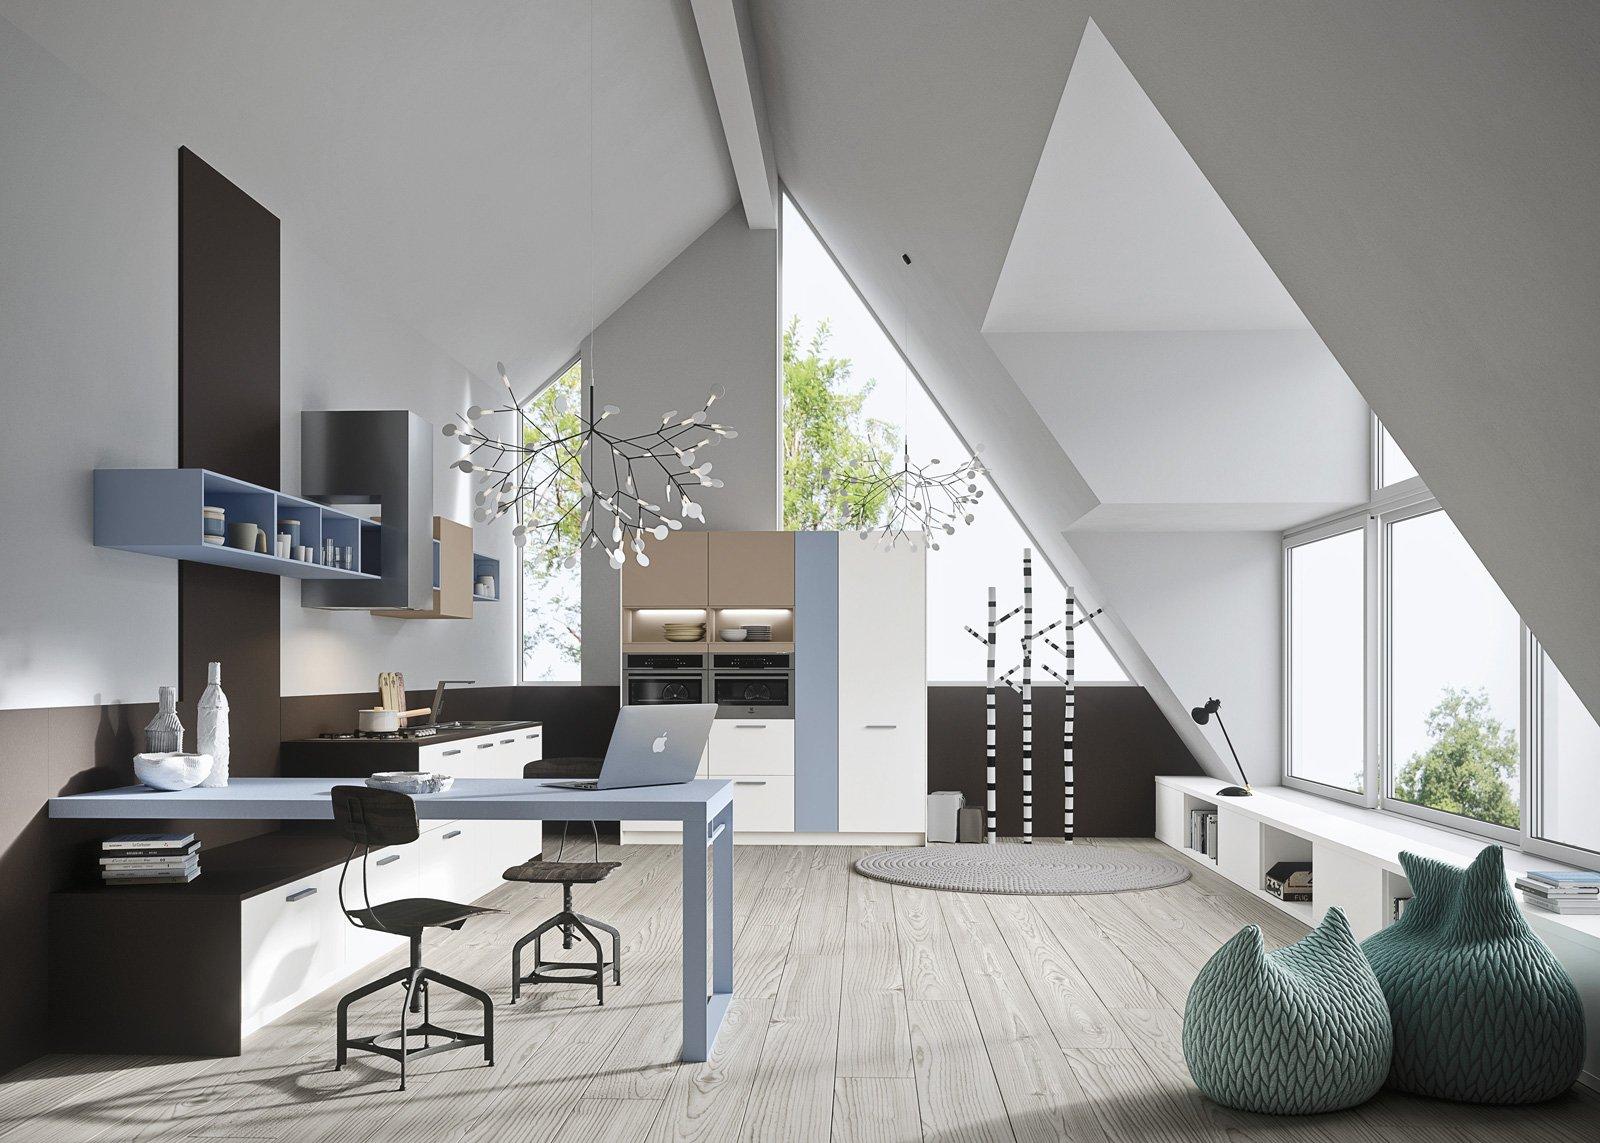 Cucine in colori ed essenze soft cose di casa - Casa arredamento moderno ...